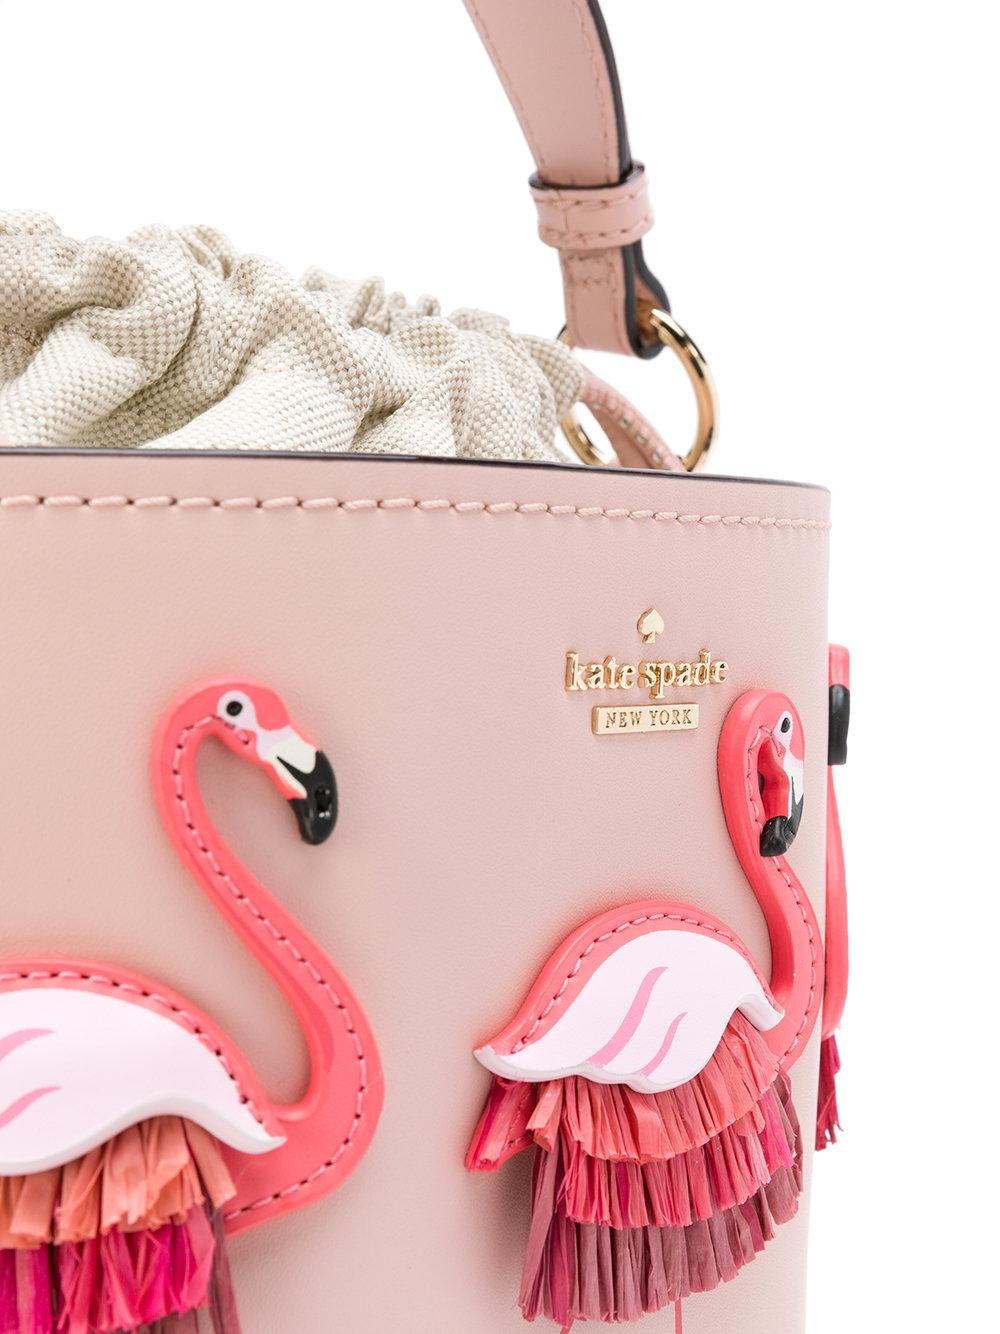 Kate Spade Leather Flamingo Embellished Tote Bag in Pink & Purple (Pink)